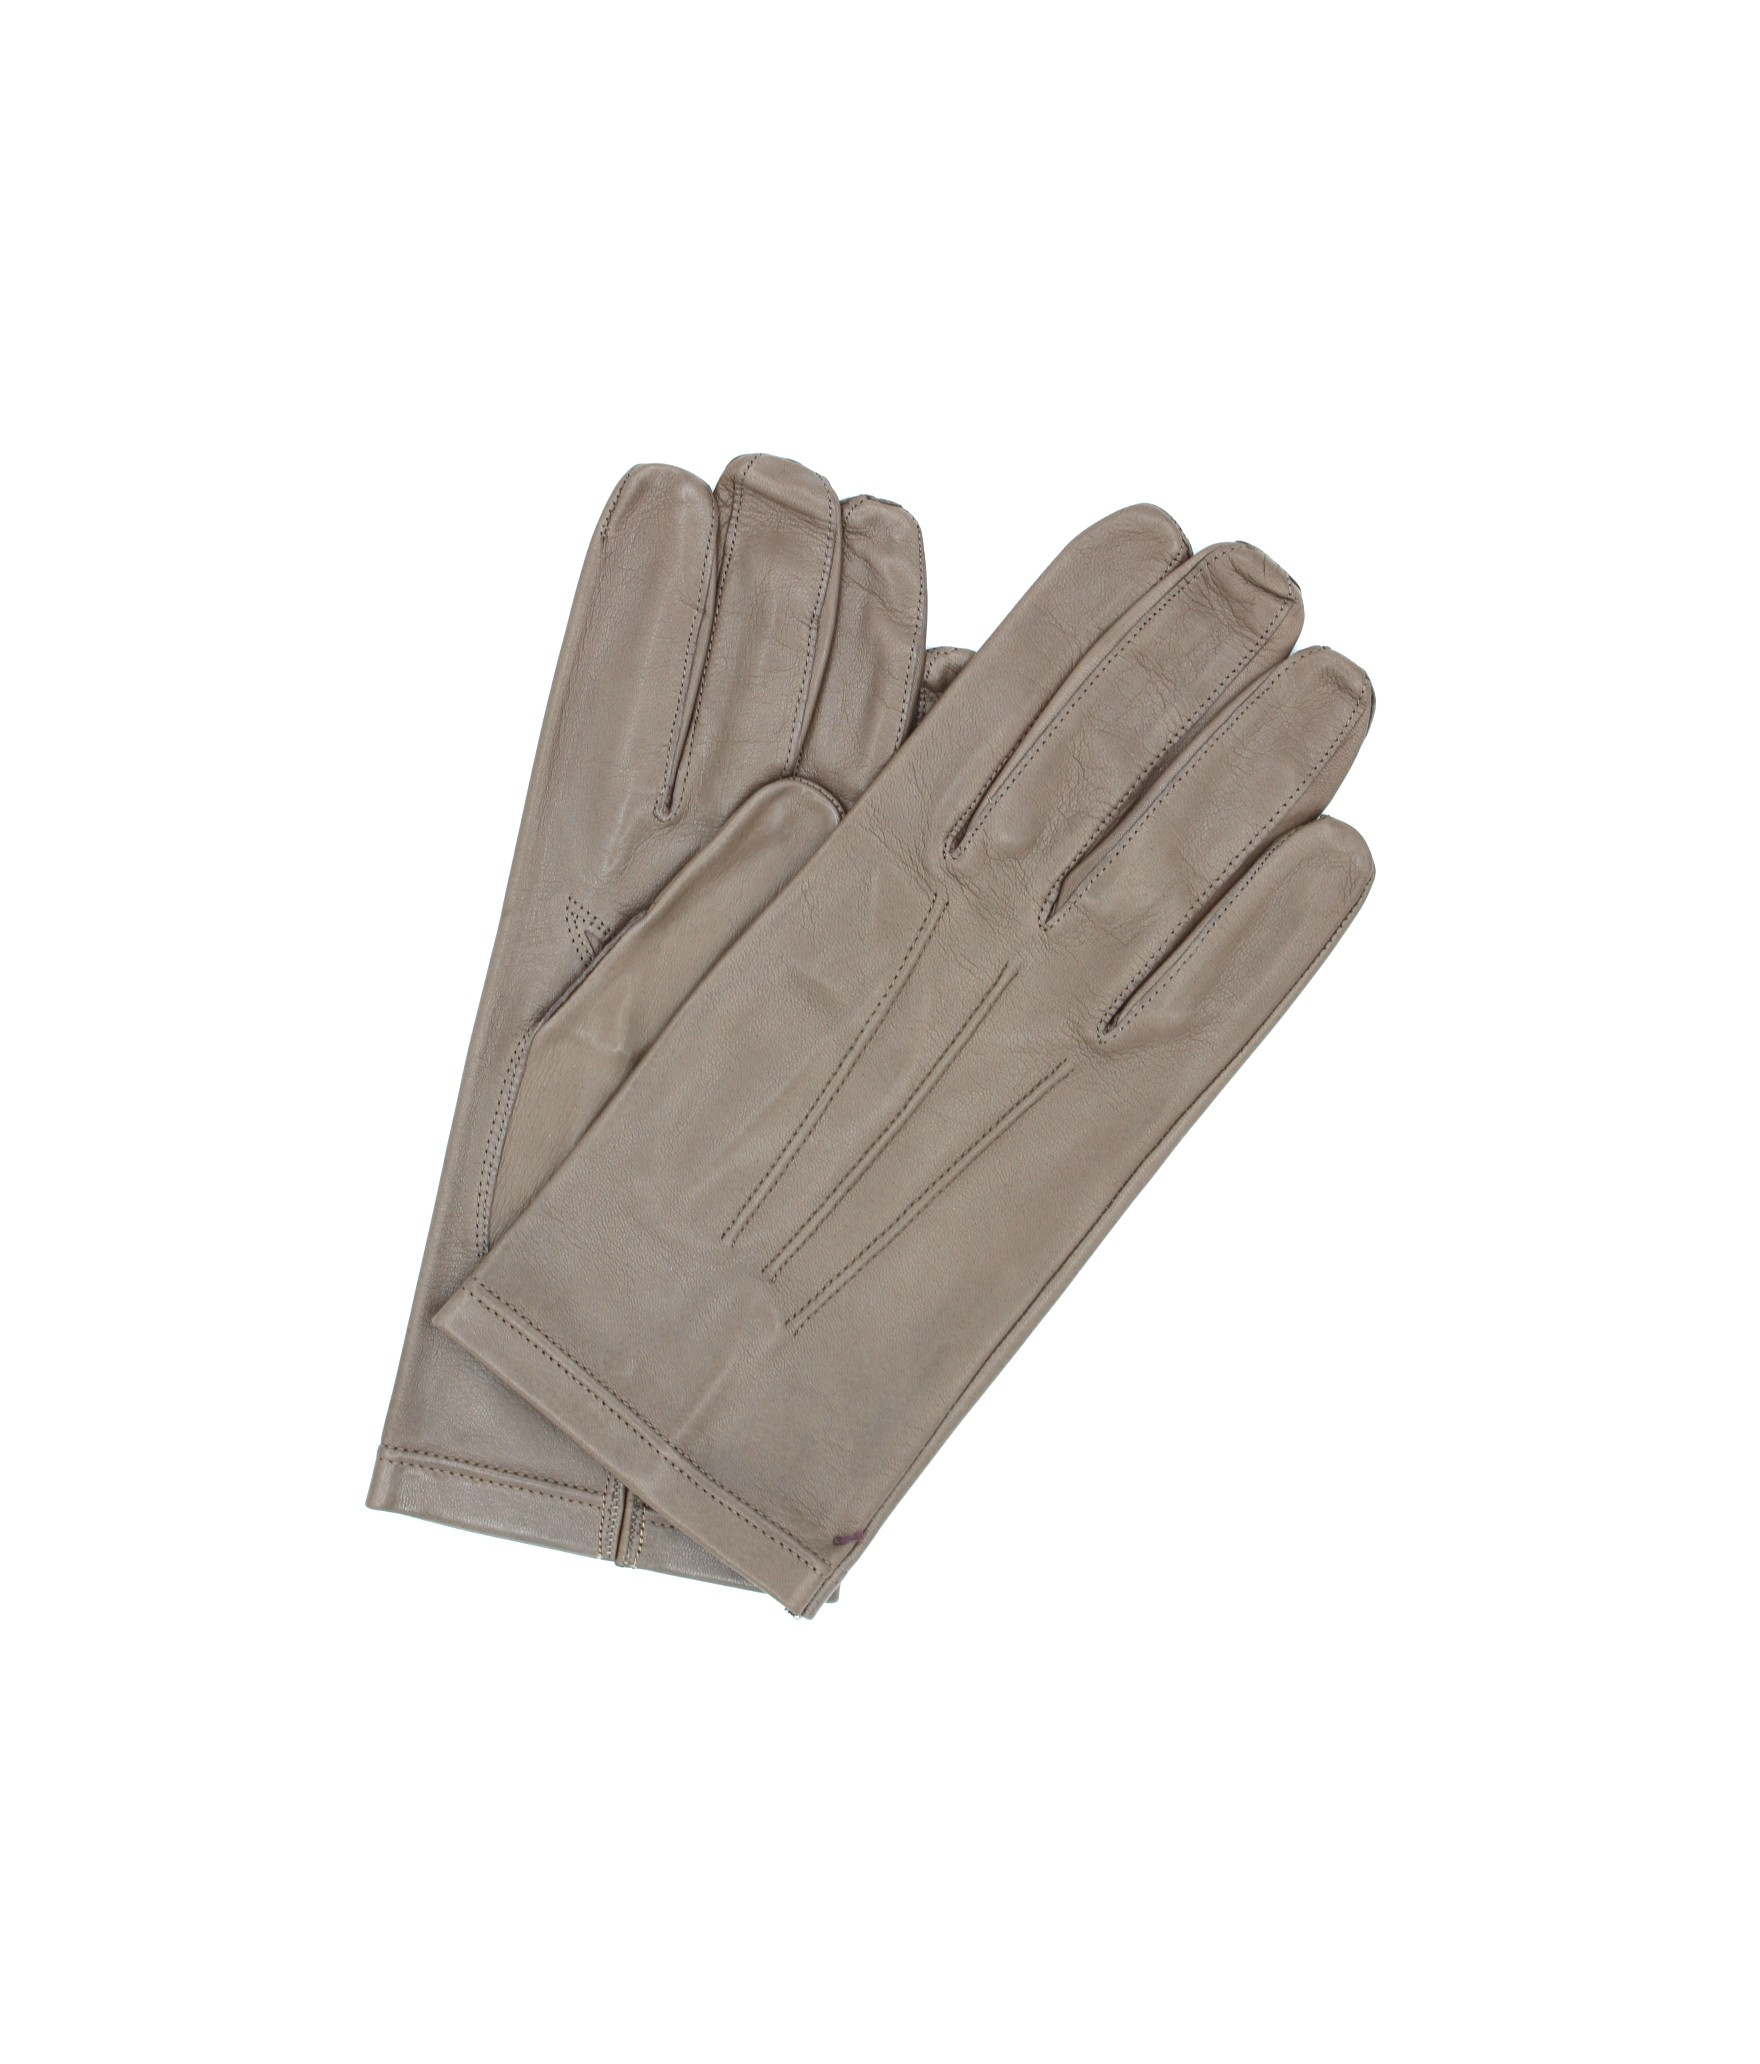 Nappa leather gloves unlined Mud Sermoneta Gloves Leather